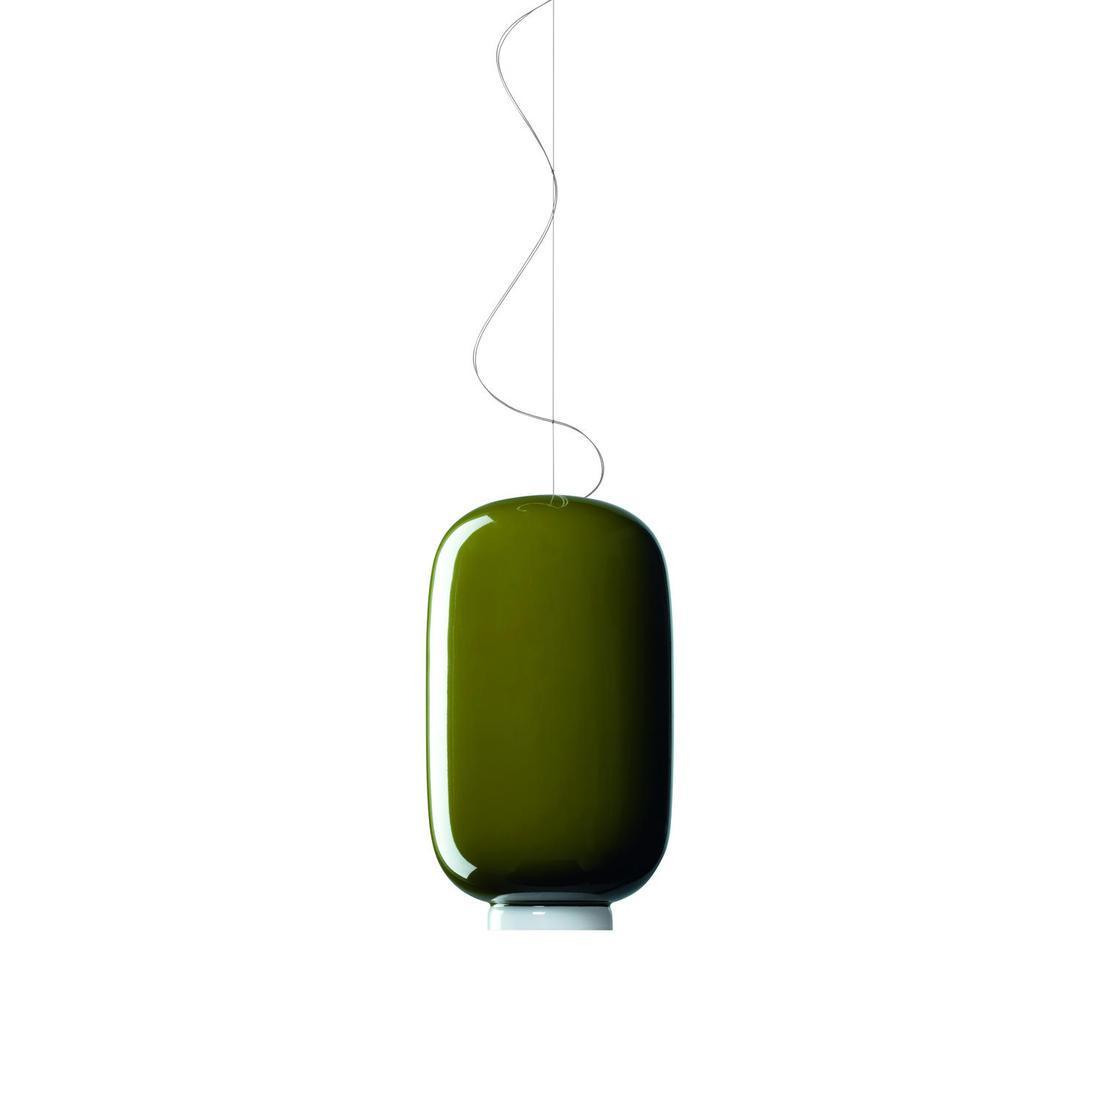 Chouchin 2 Lámpara colgante cable 5 metros LED 24W Blanco y Verde